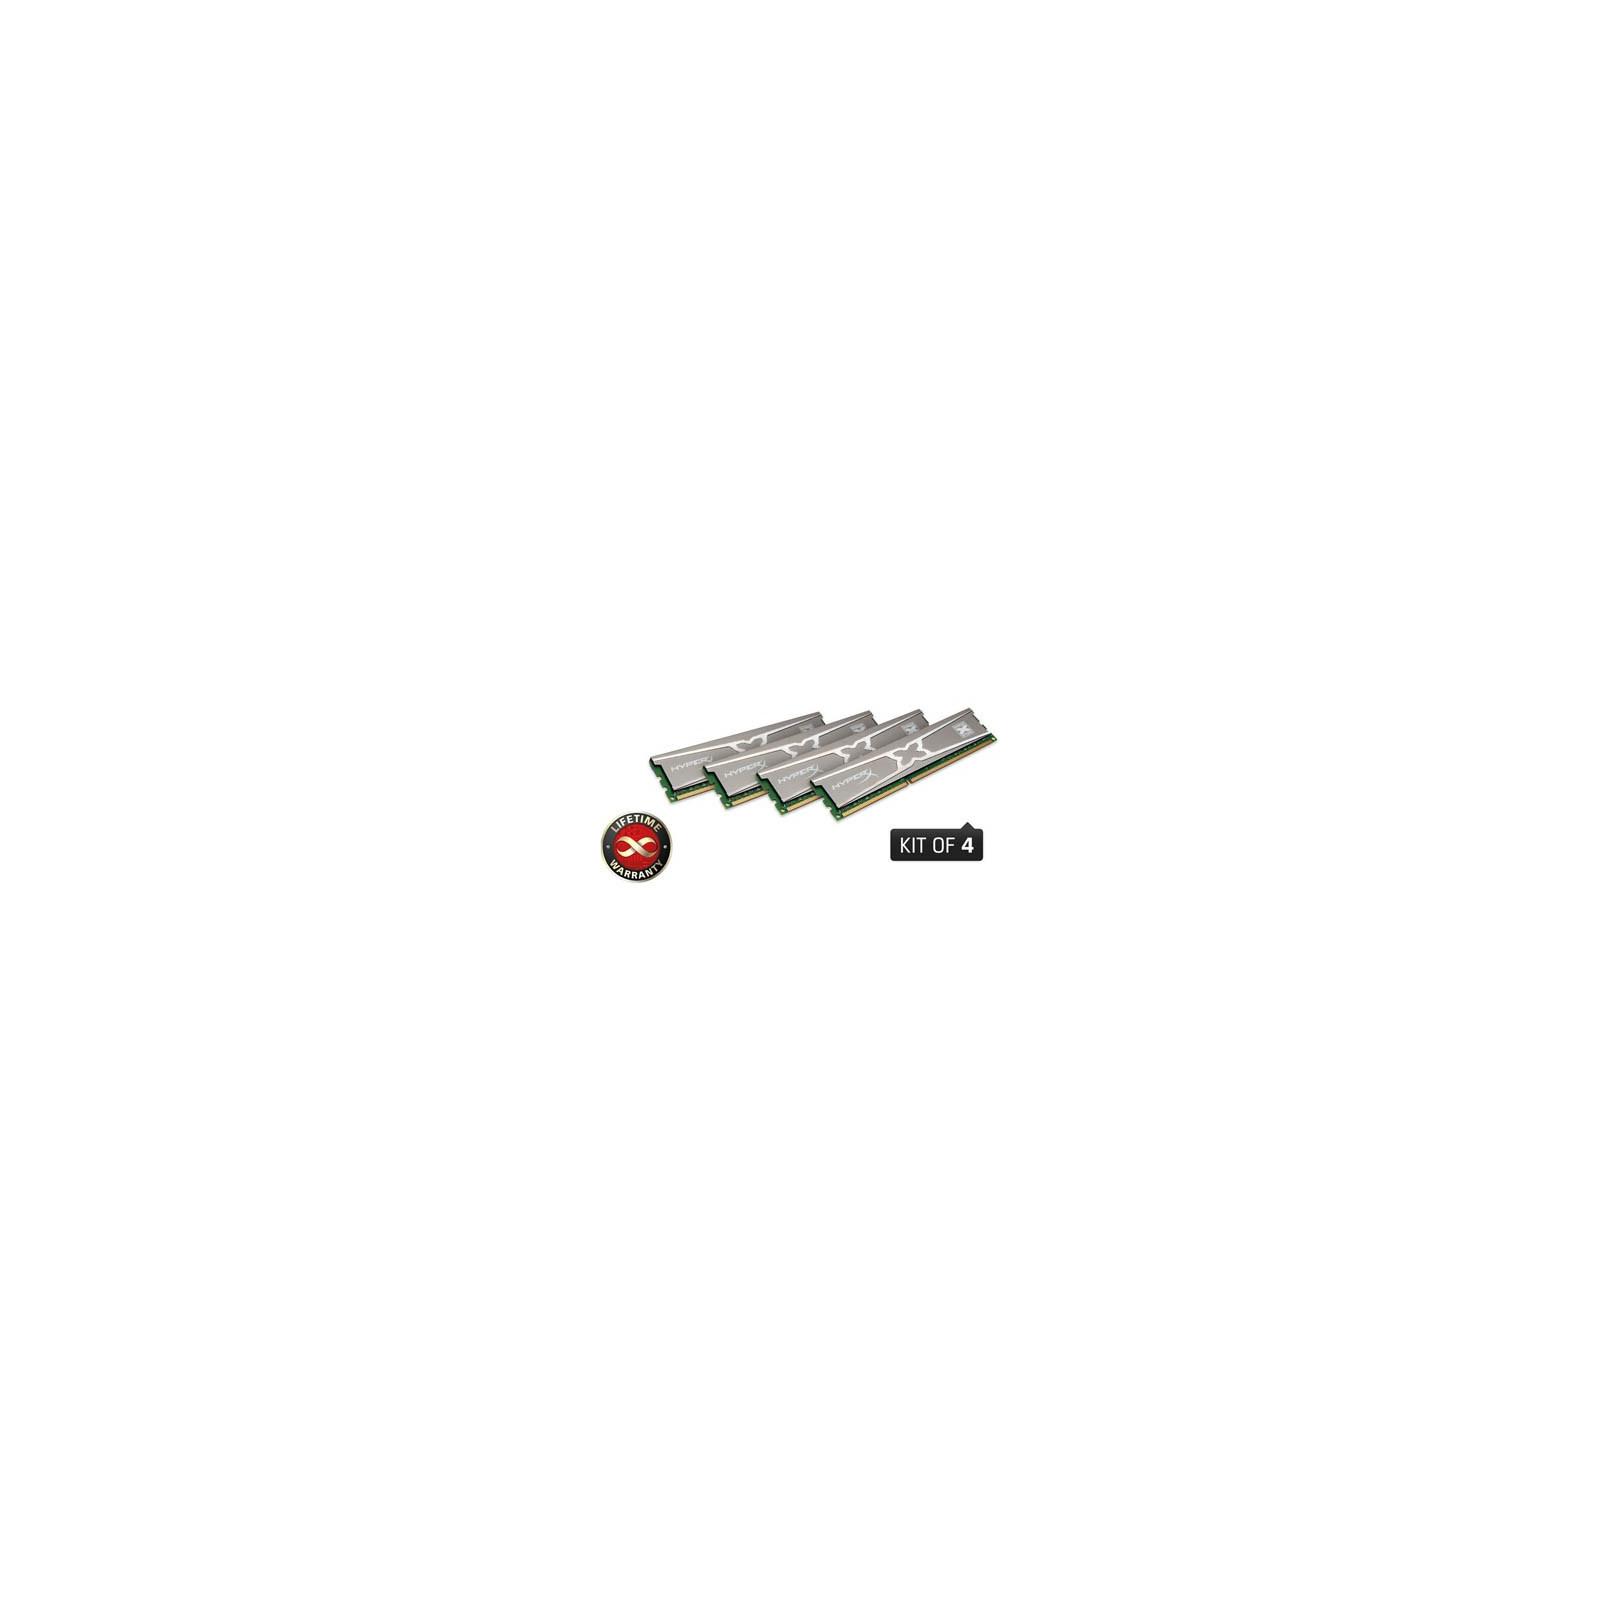 Модуль памяти для компьютера DDR3 16GB (4x4GB) 1600 MHz Kingston (KHX16C9X3K4/16X)